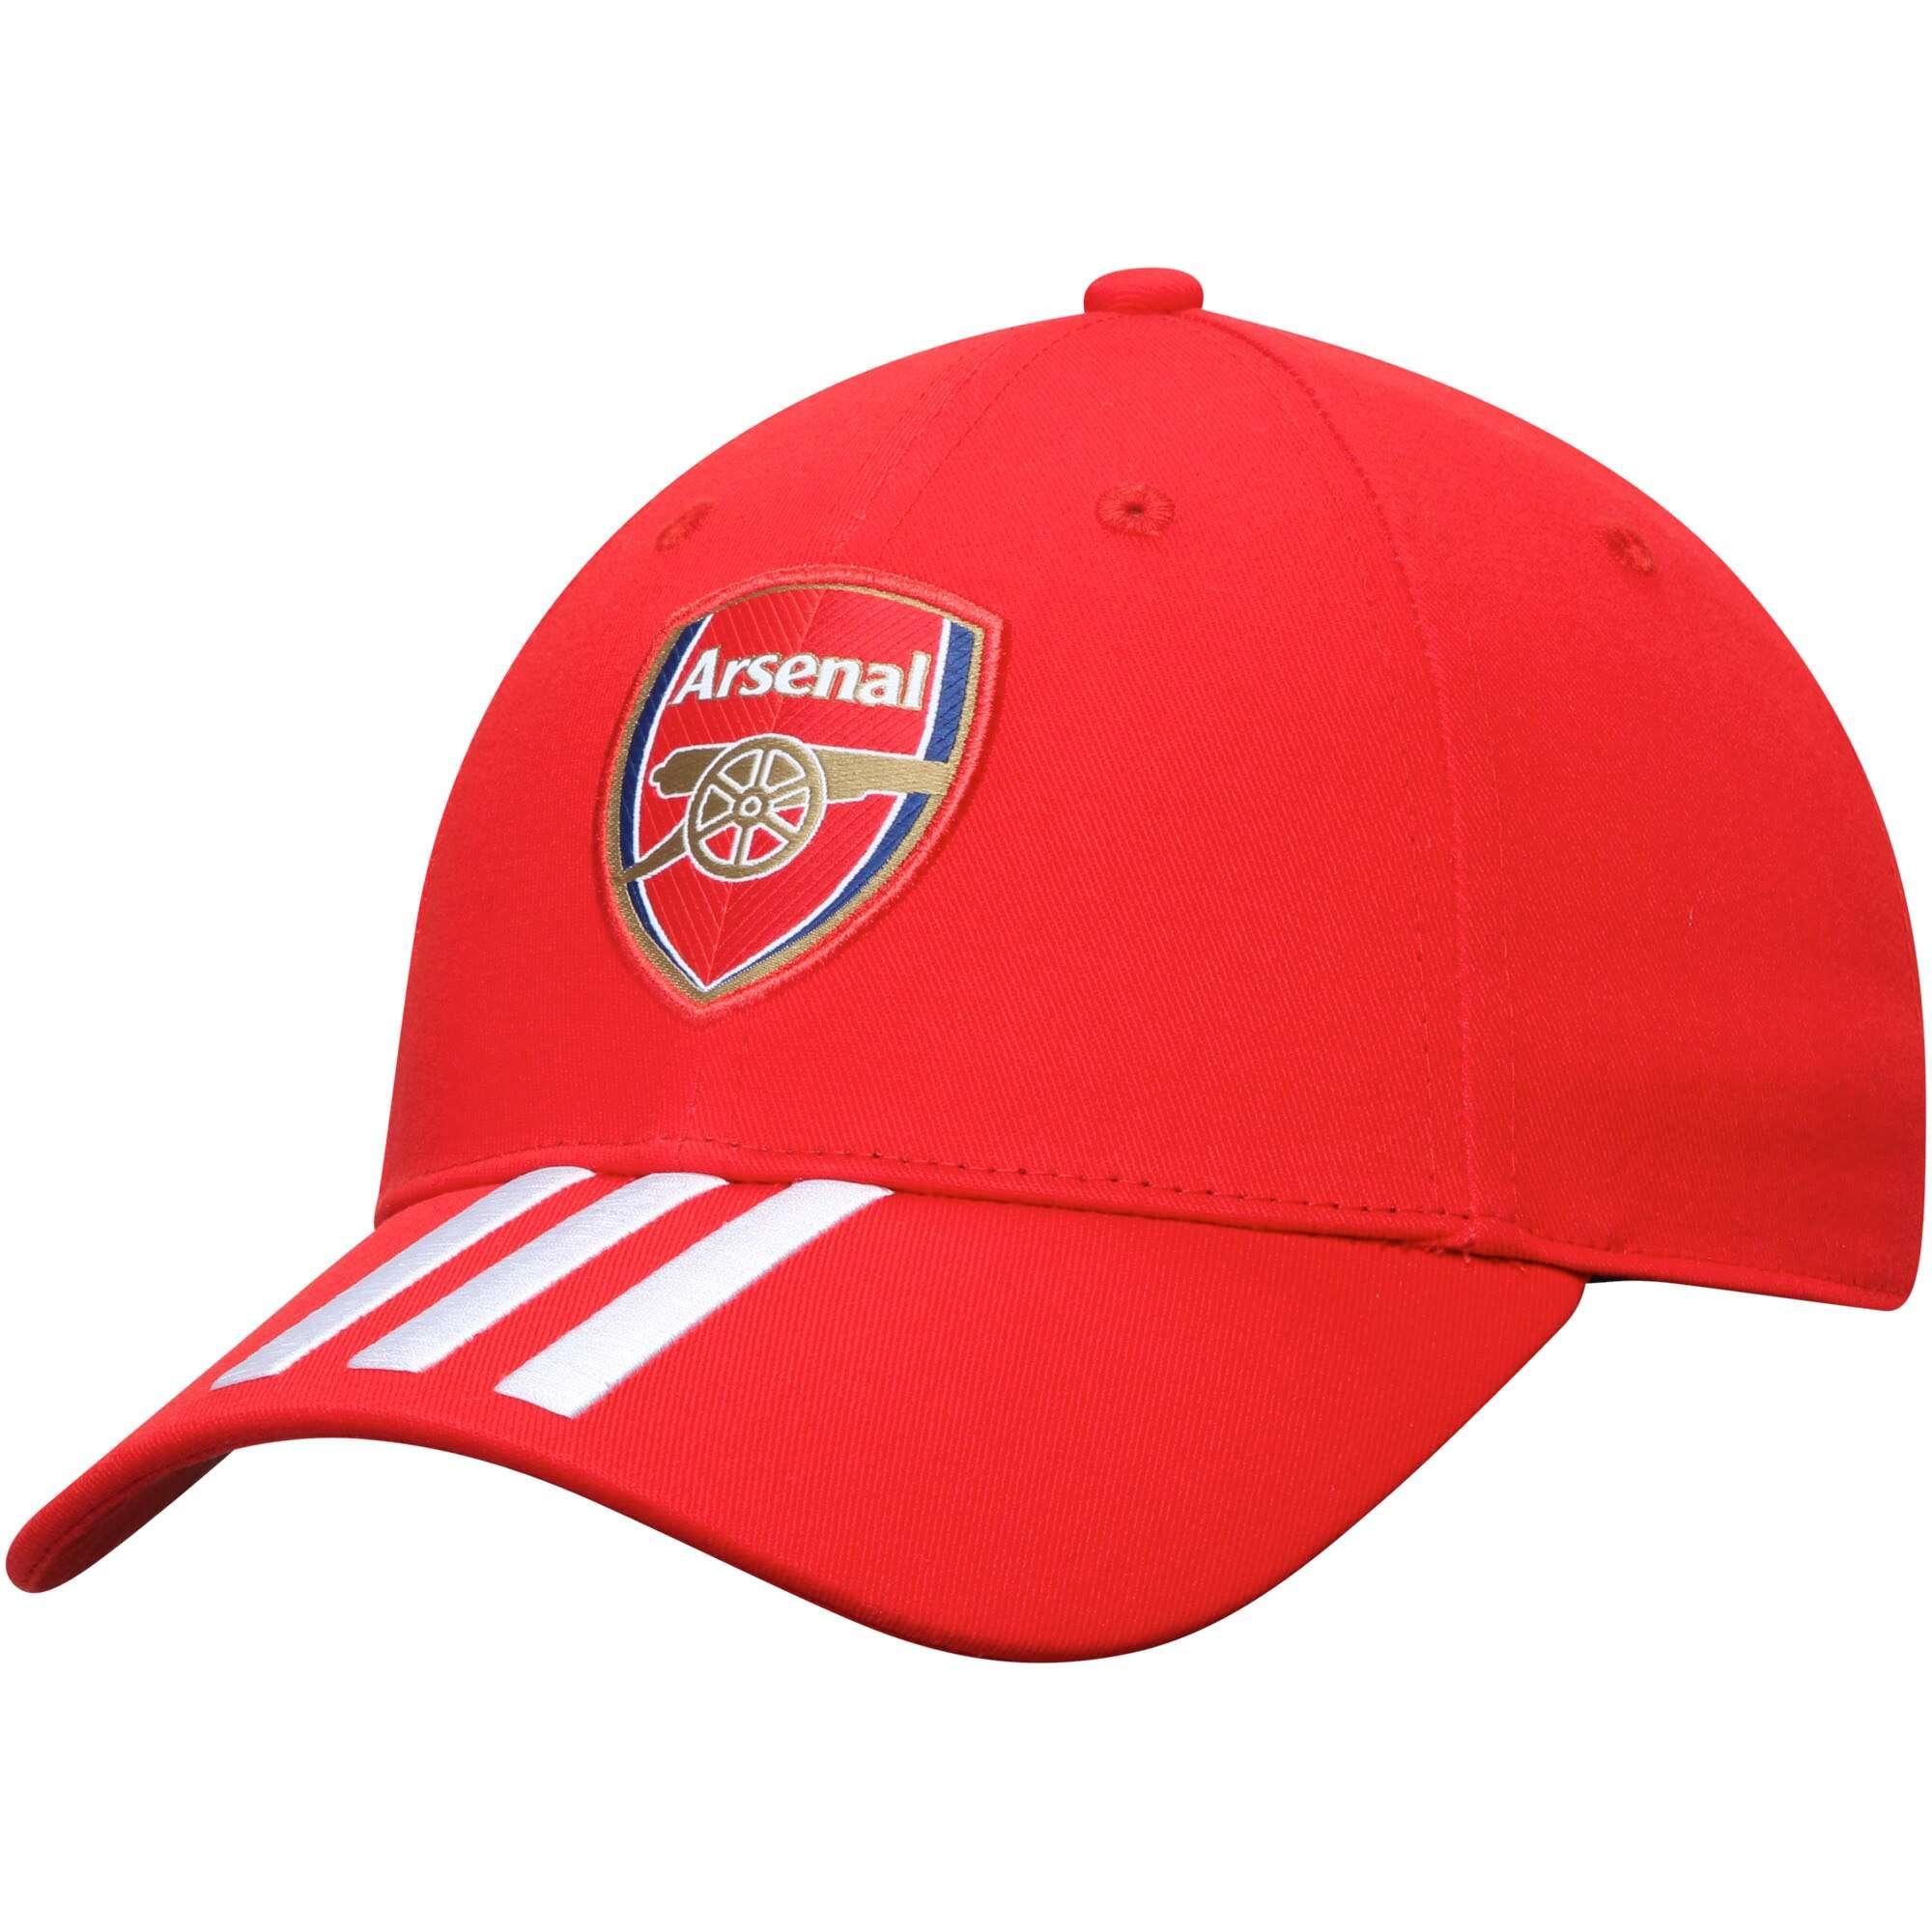 Hat: Soccer - Arsenal Scarlet C40 Photo